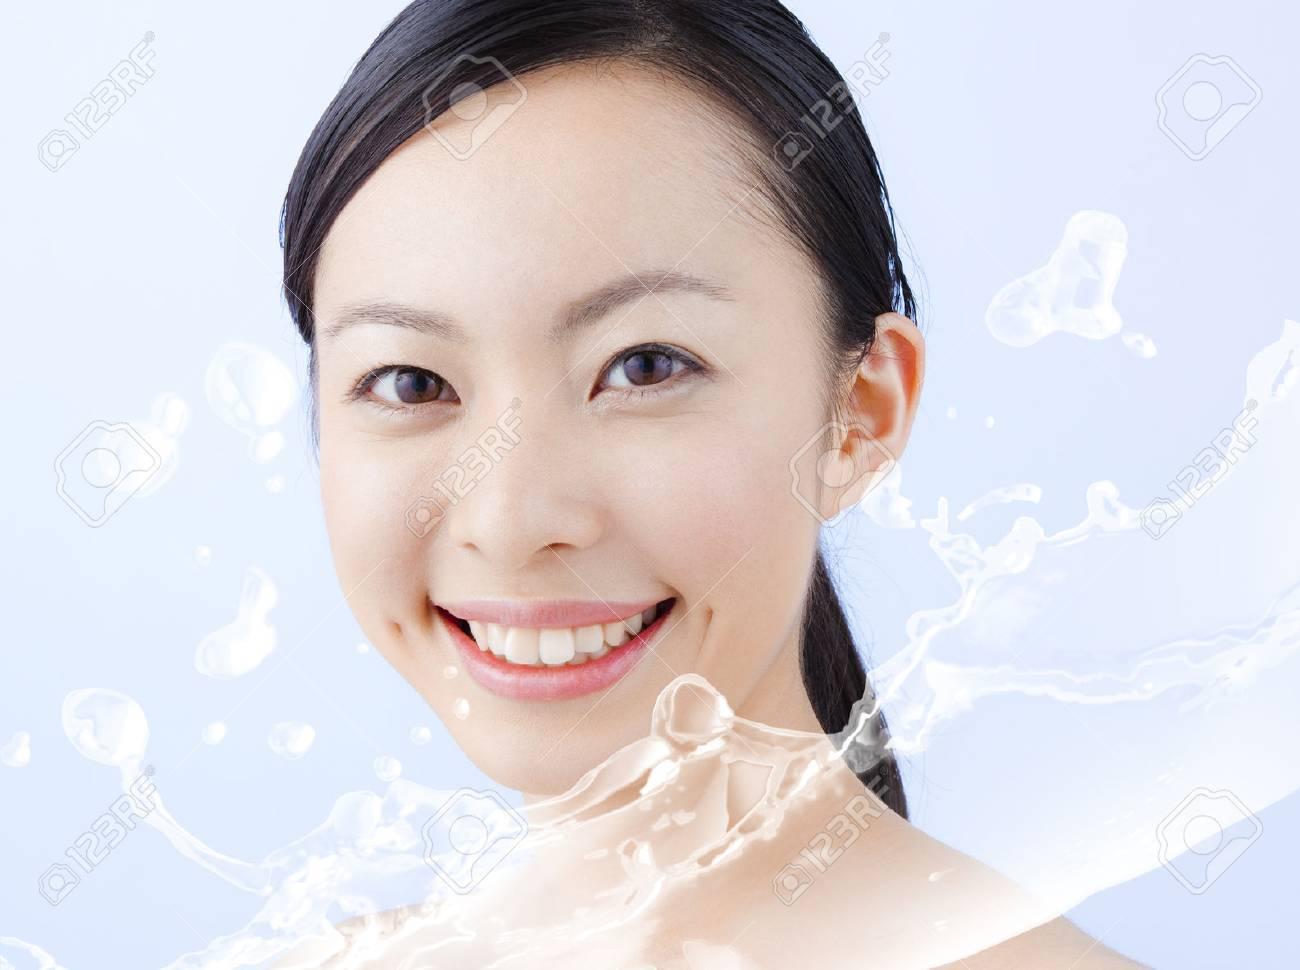 Beauty Standard-Bild - 50223198